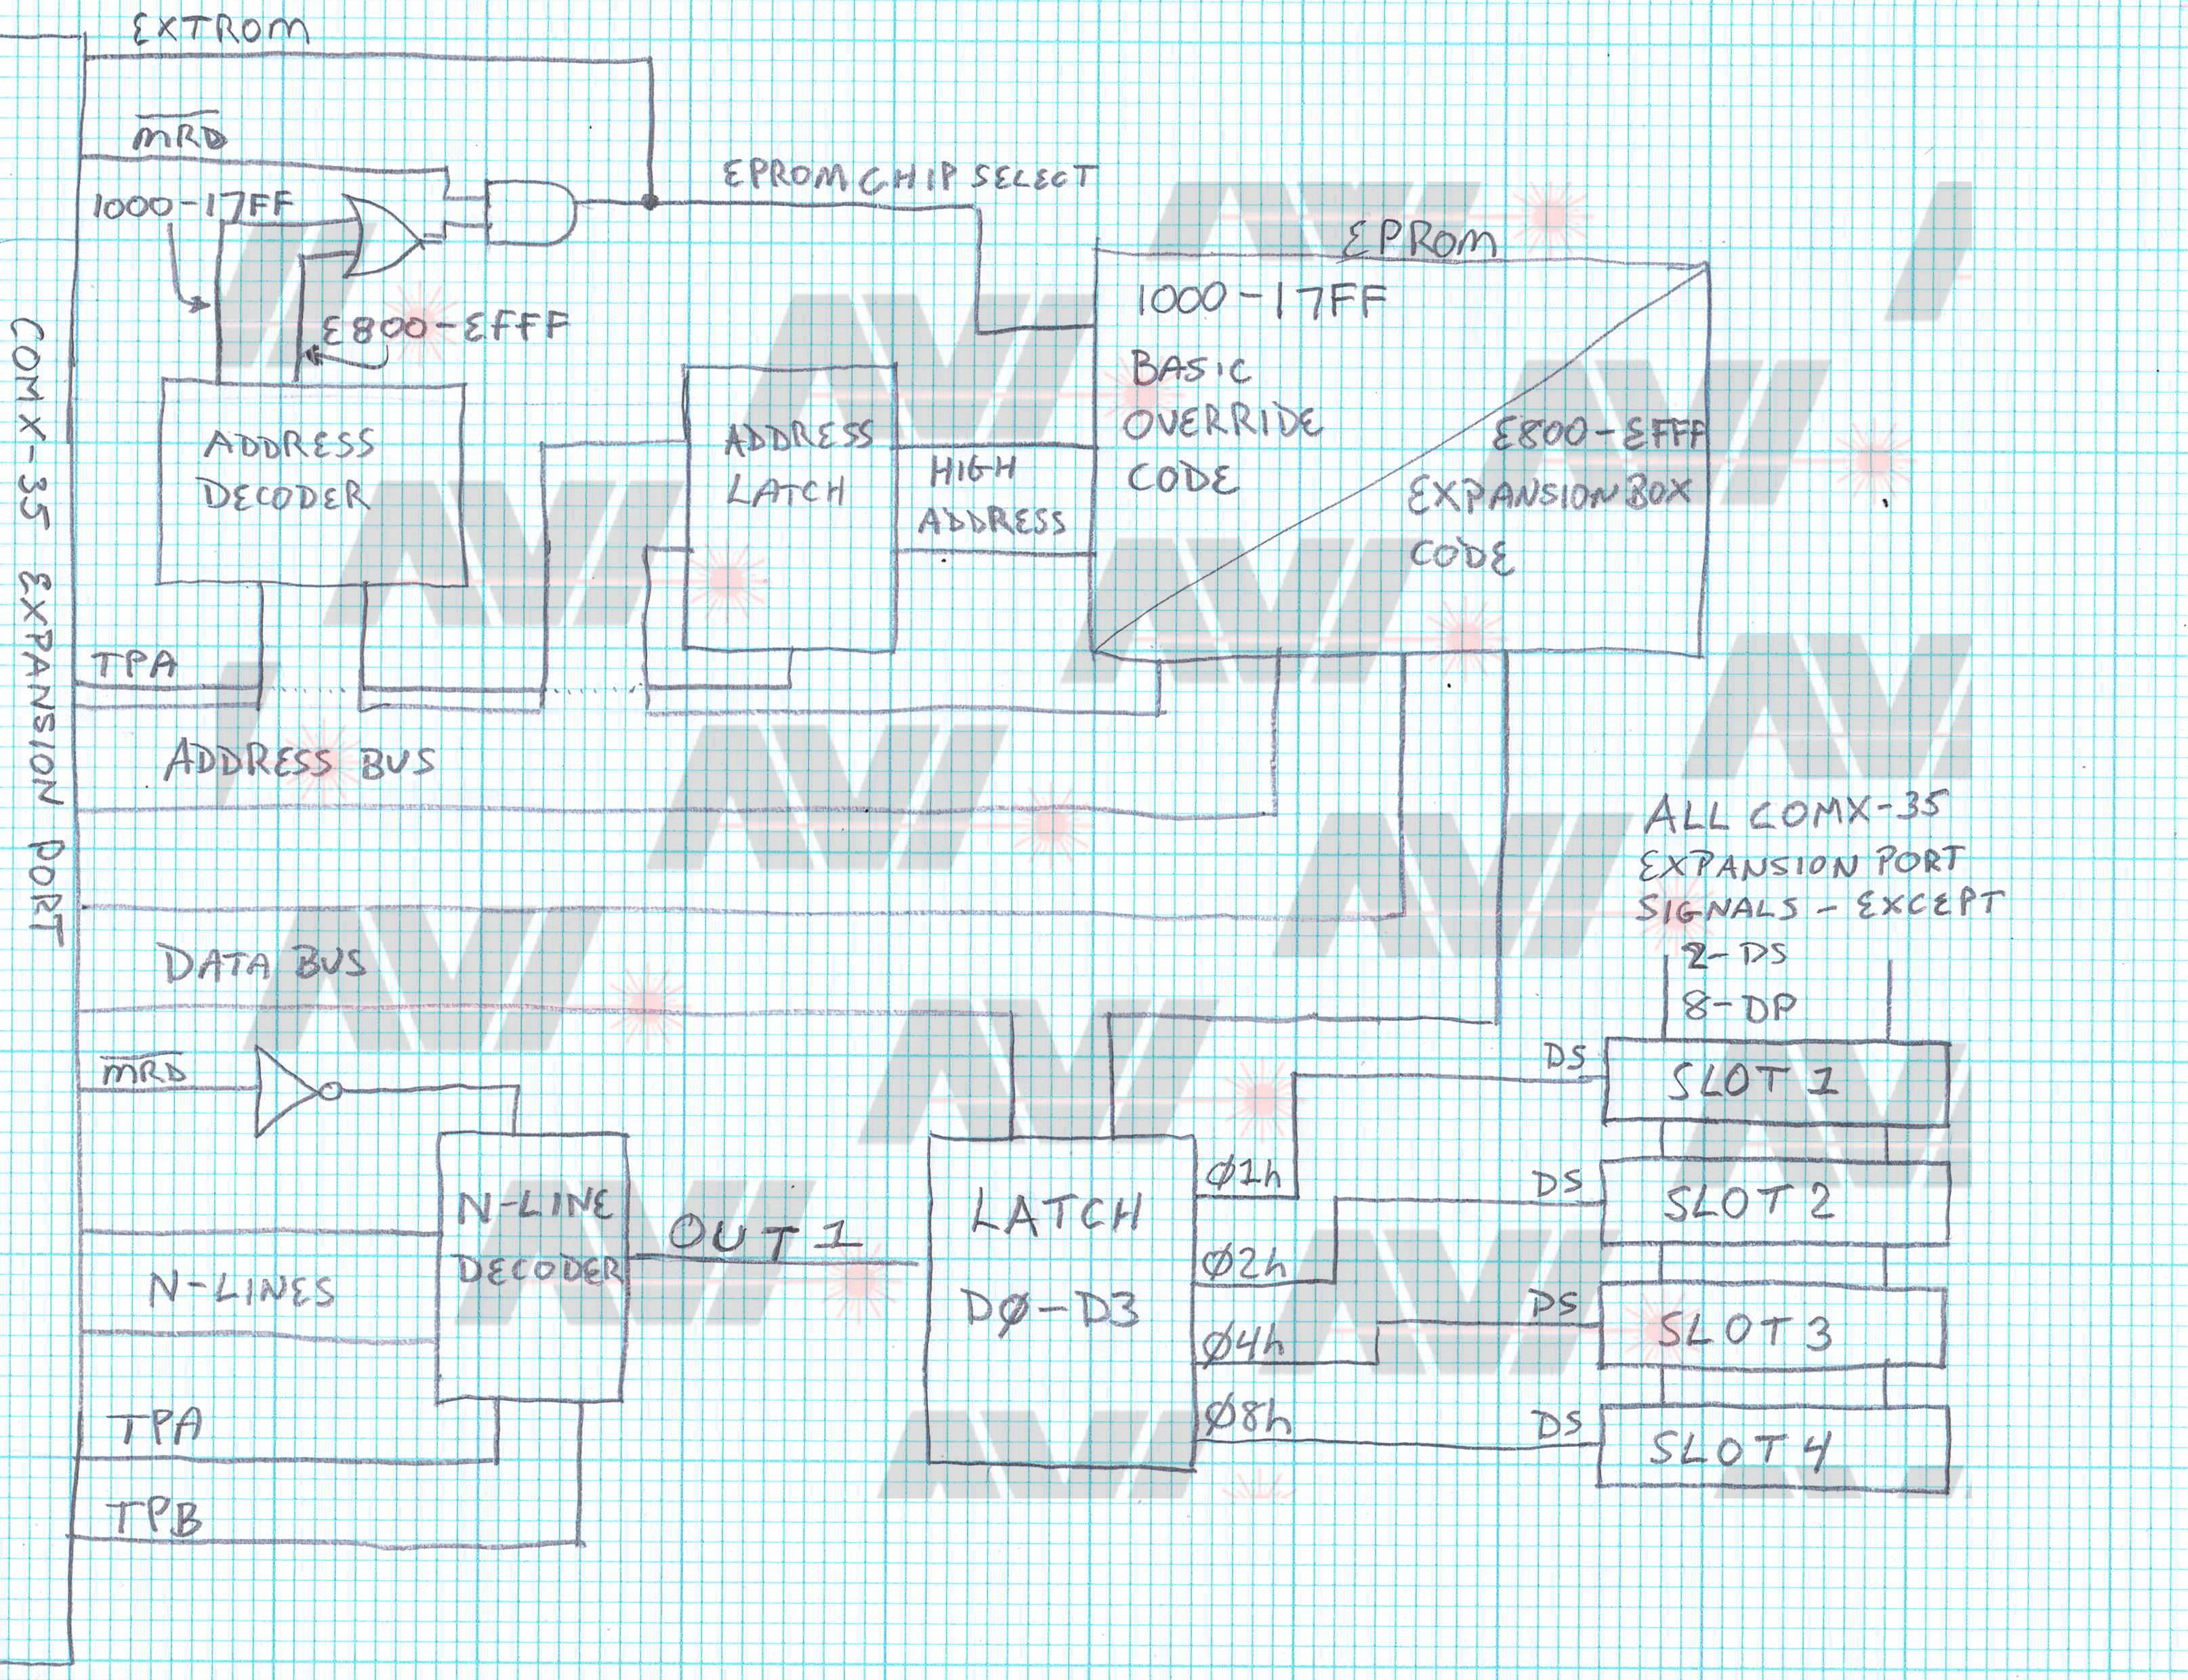 Vespa Gt200 Wiring Diagram : Vespa gt wiring diagram accessories elsavadorla